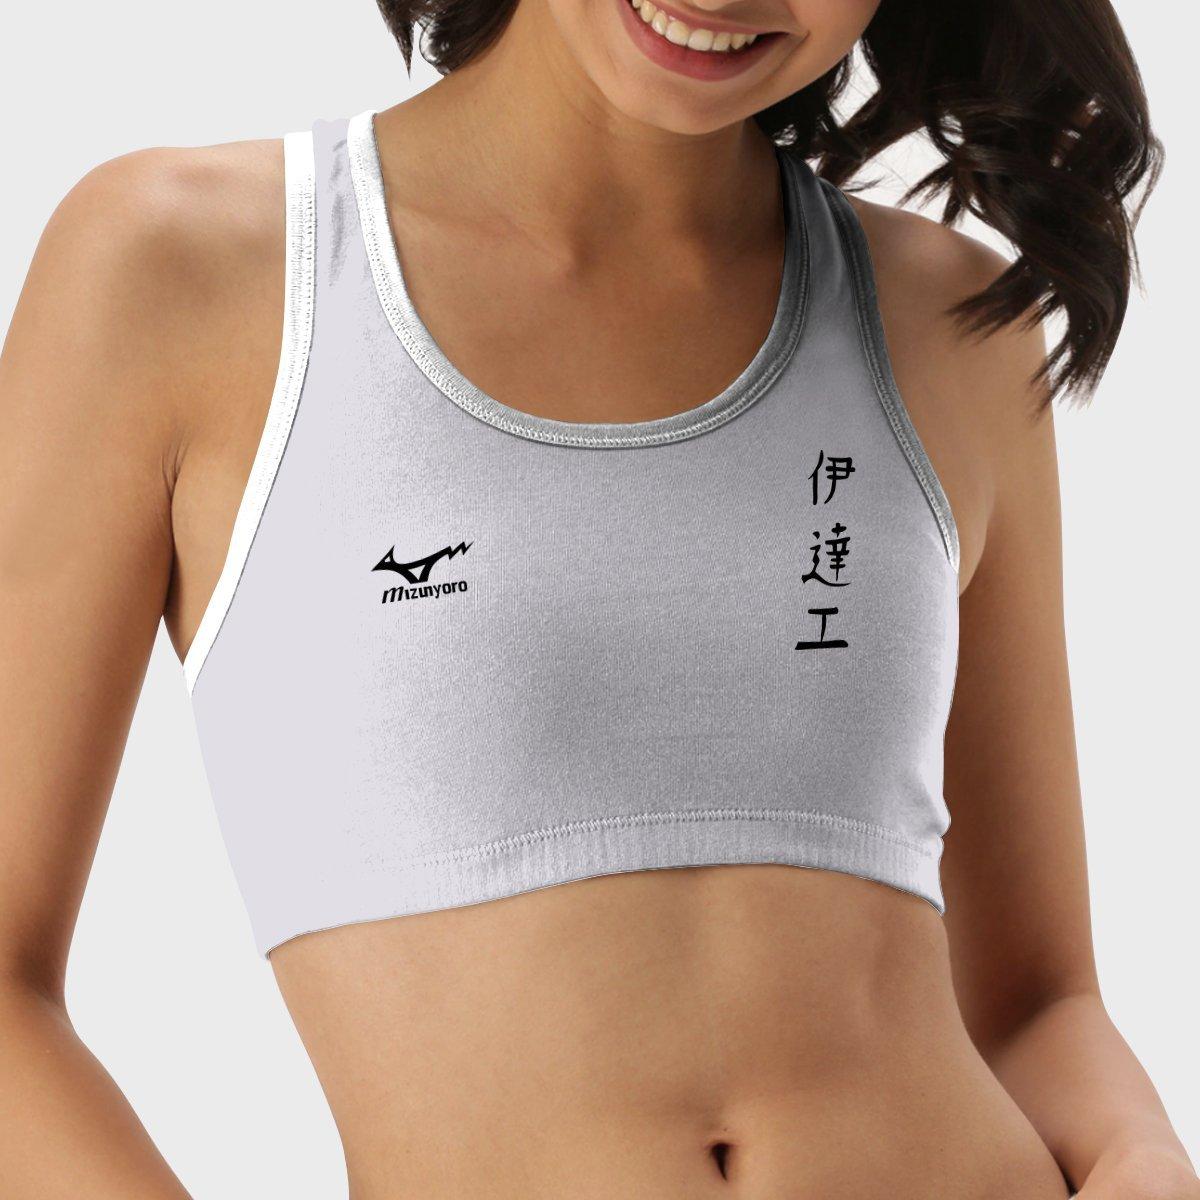 team datekou active wear set 145721 - Anime Swimsuits